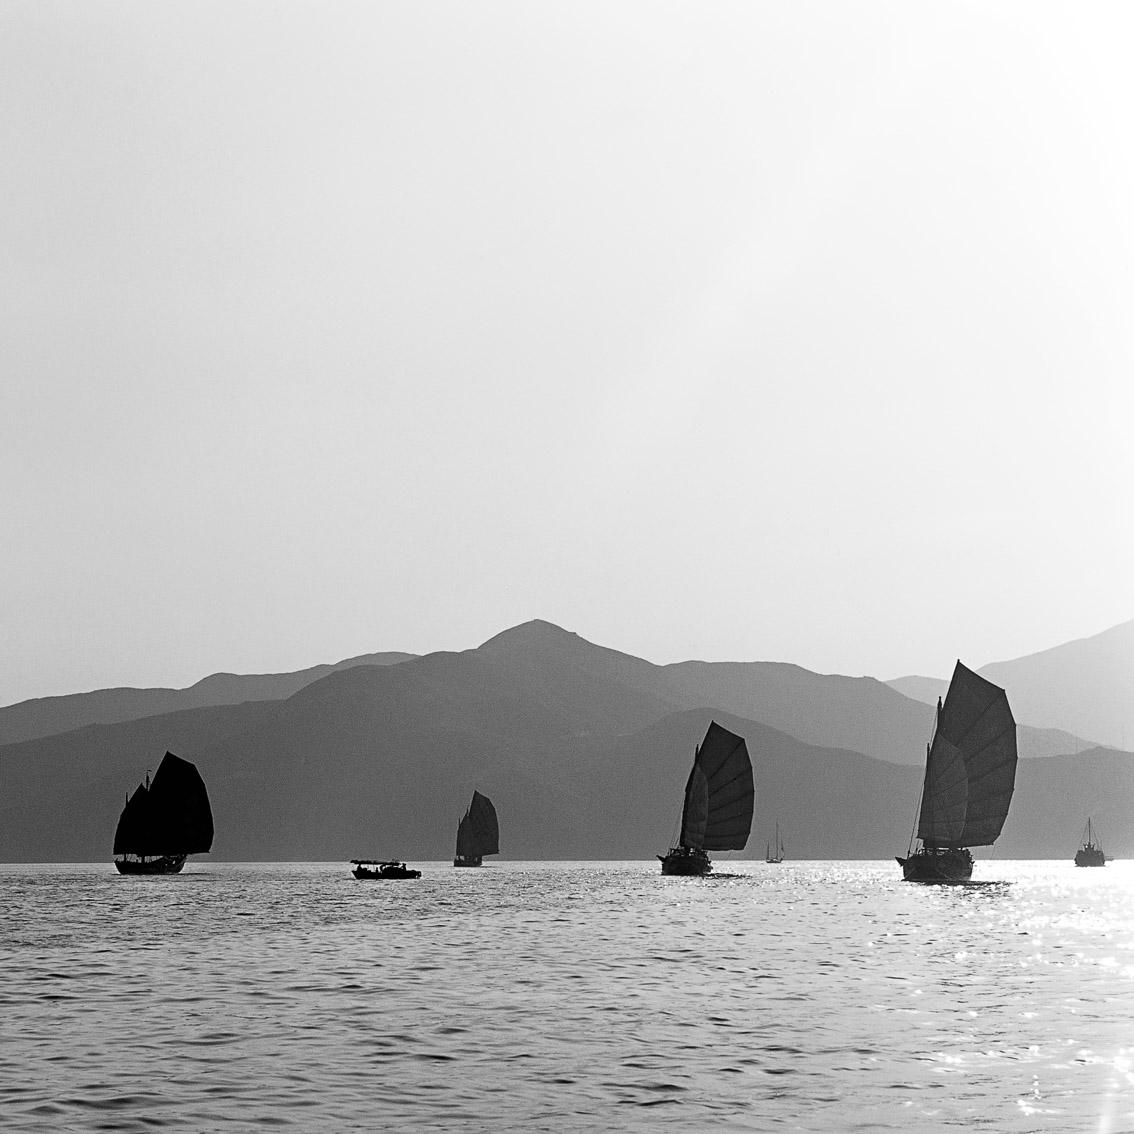 4 Junks off Fa Tau Mun, 1975